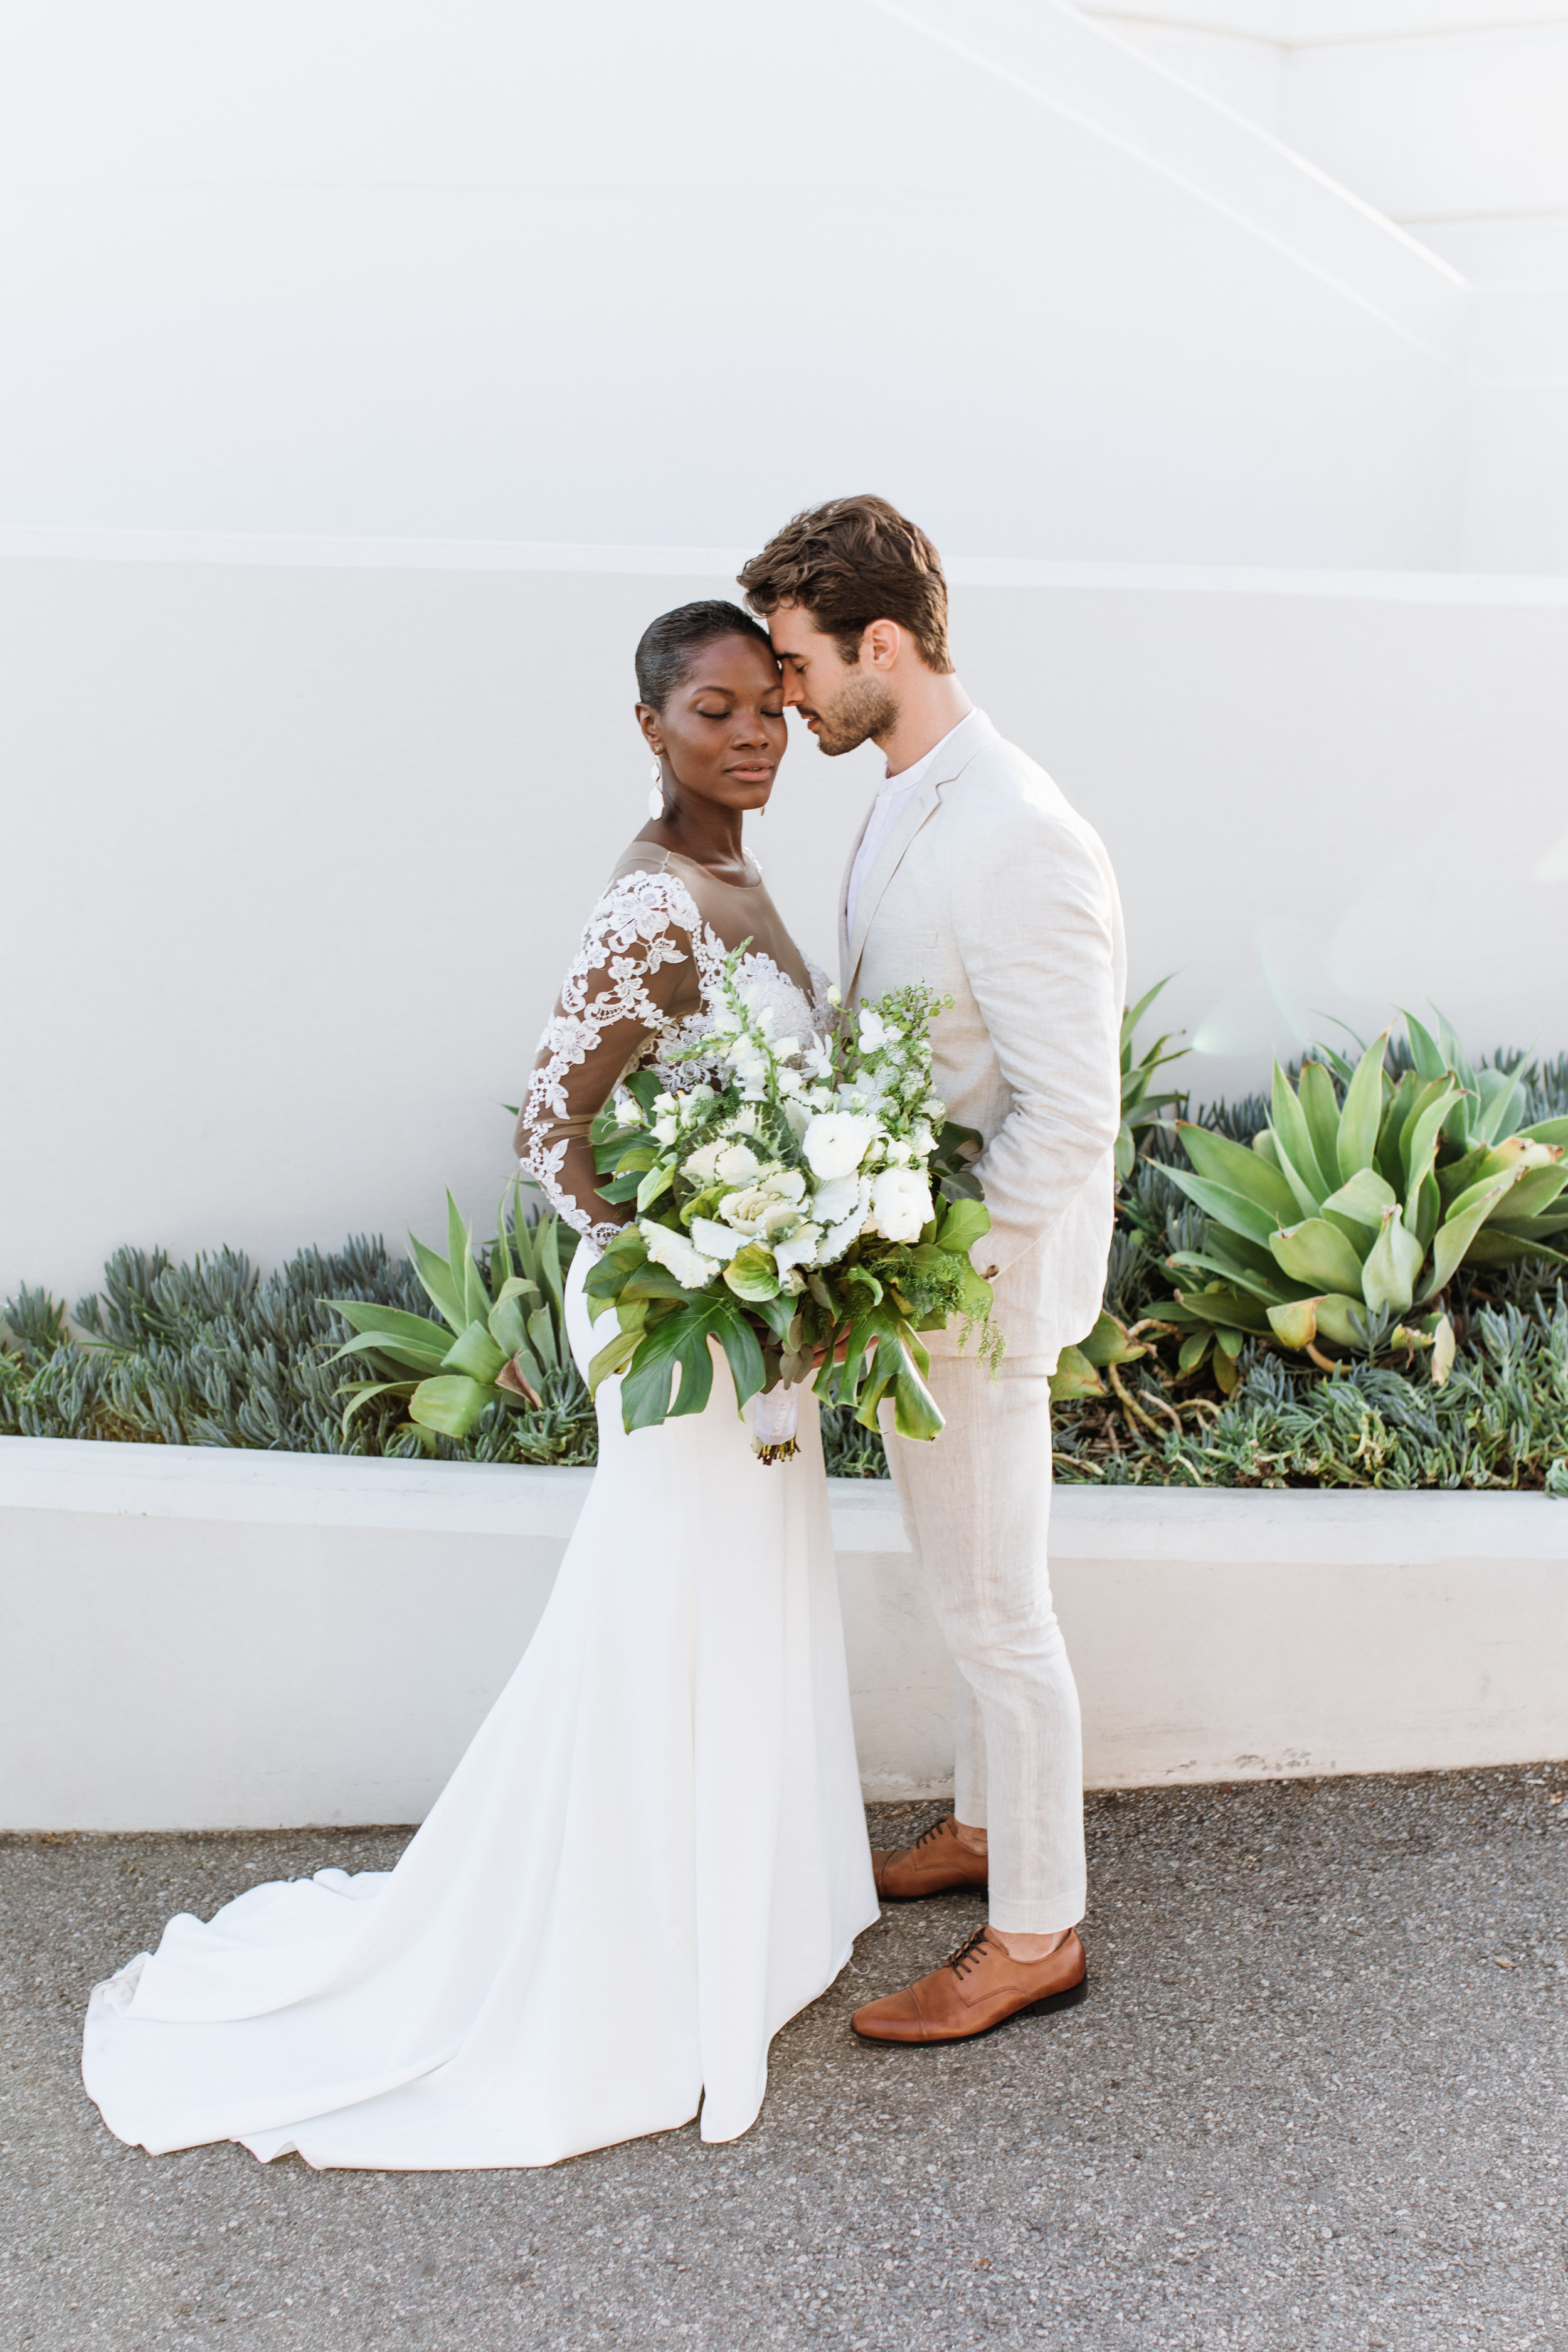 los-angeles-california-griffith-observatory-wedding-bridal-photography-michael-cozzens-70.jpg